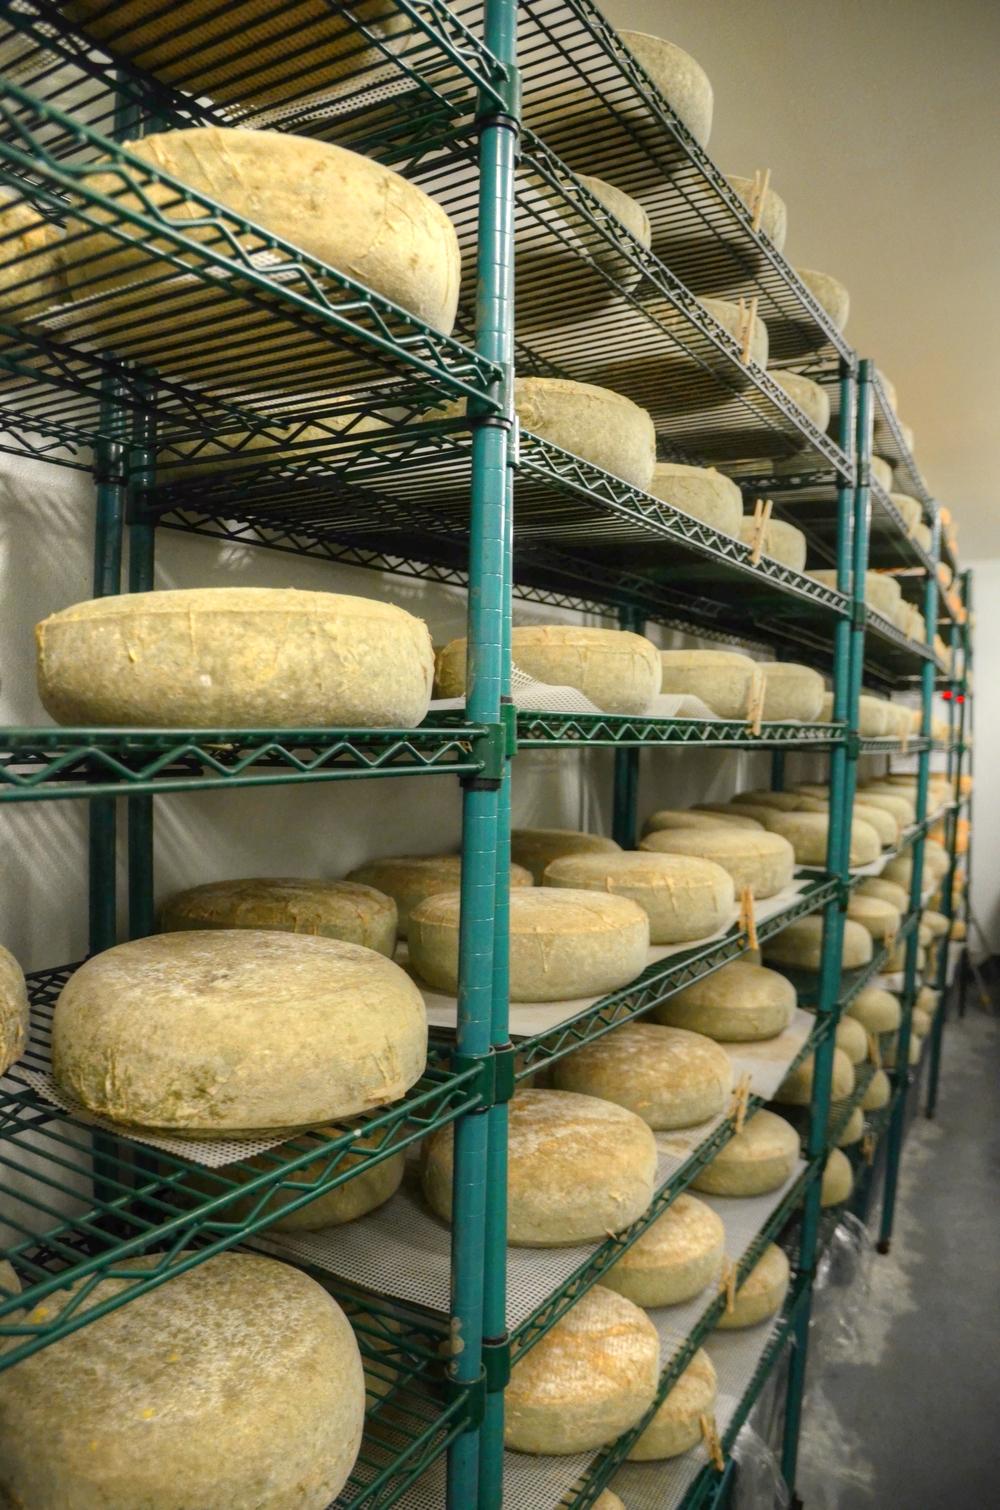 stepladder-cheese_4124.jpg